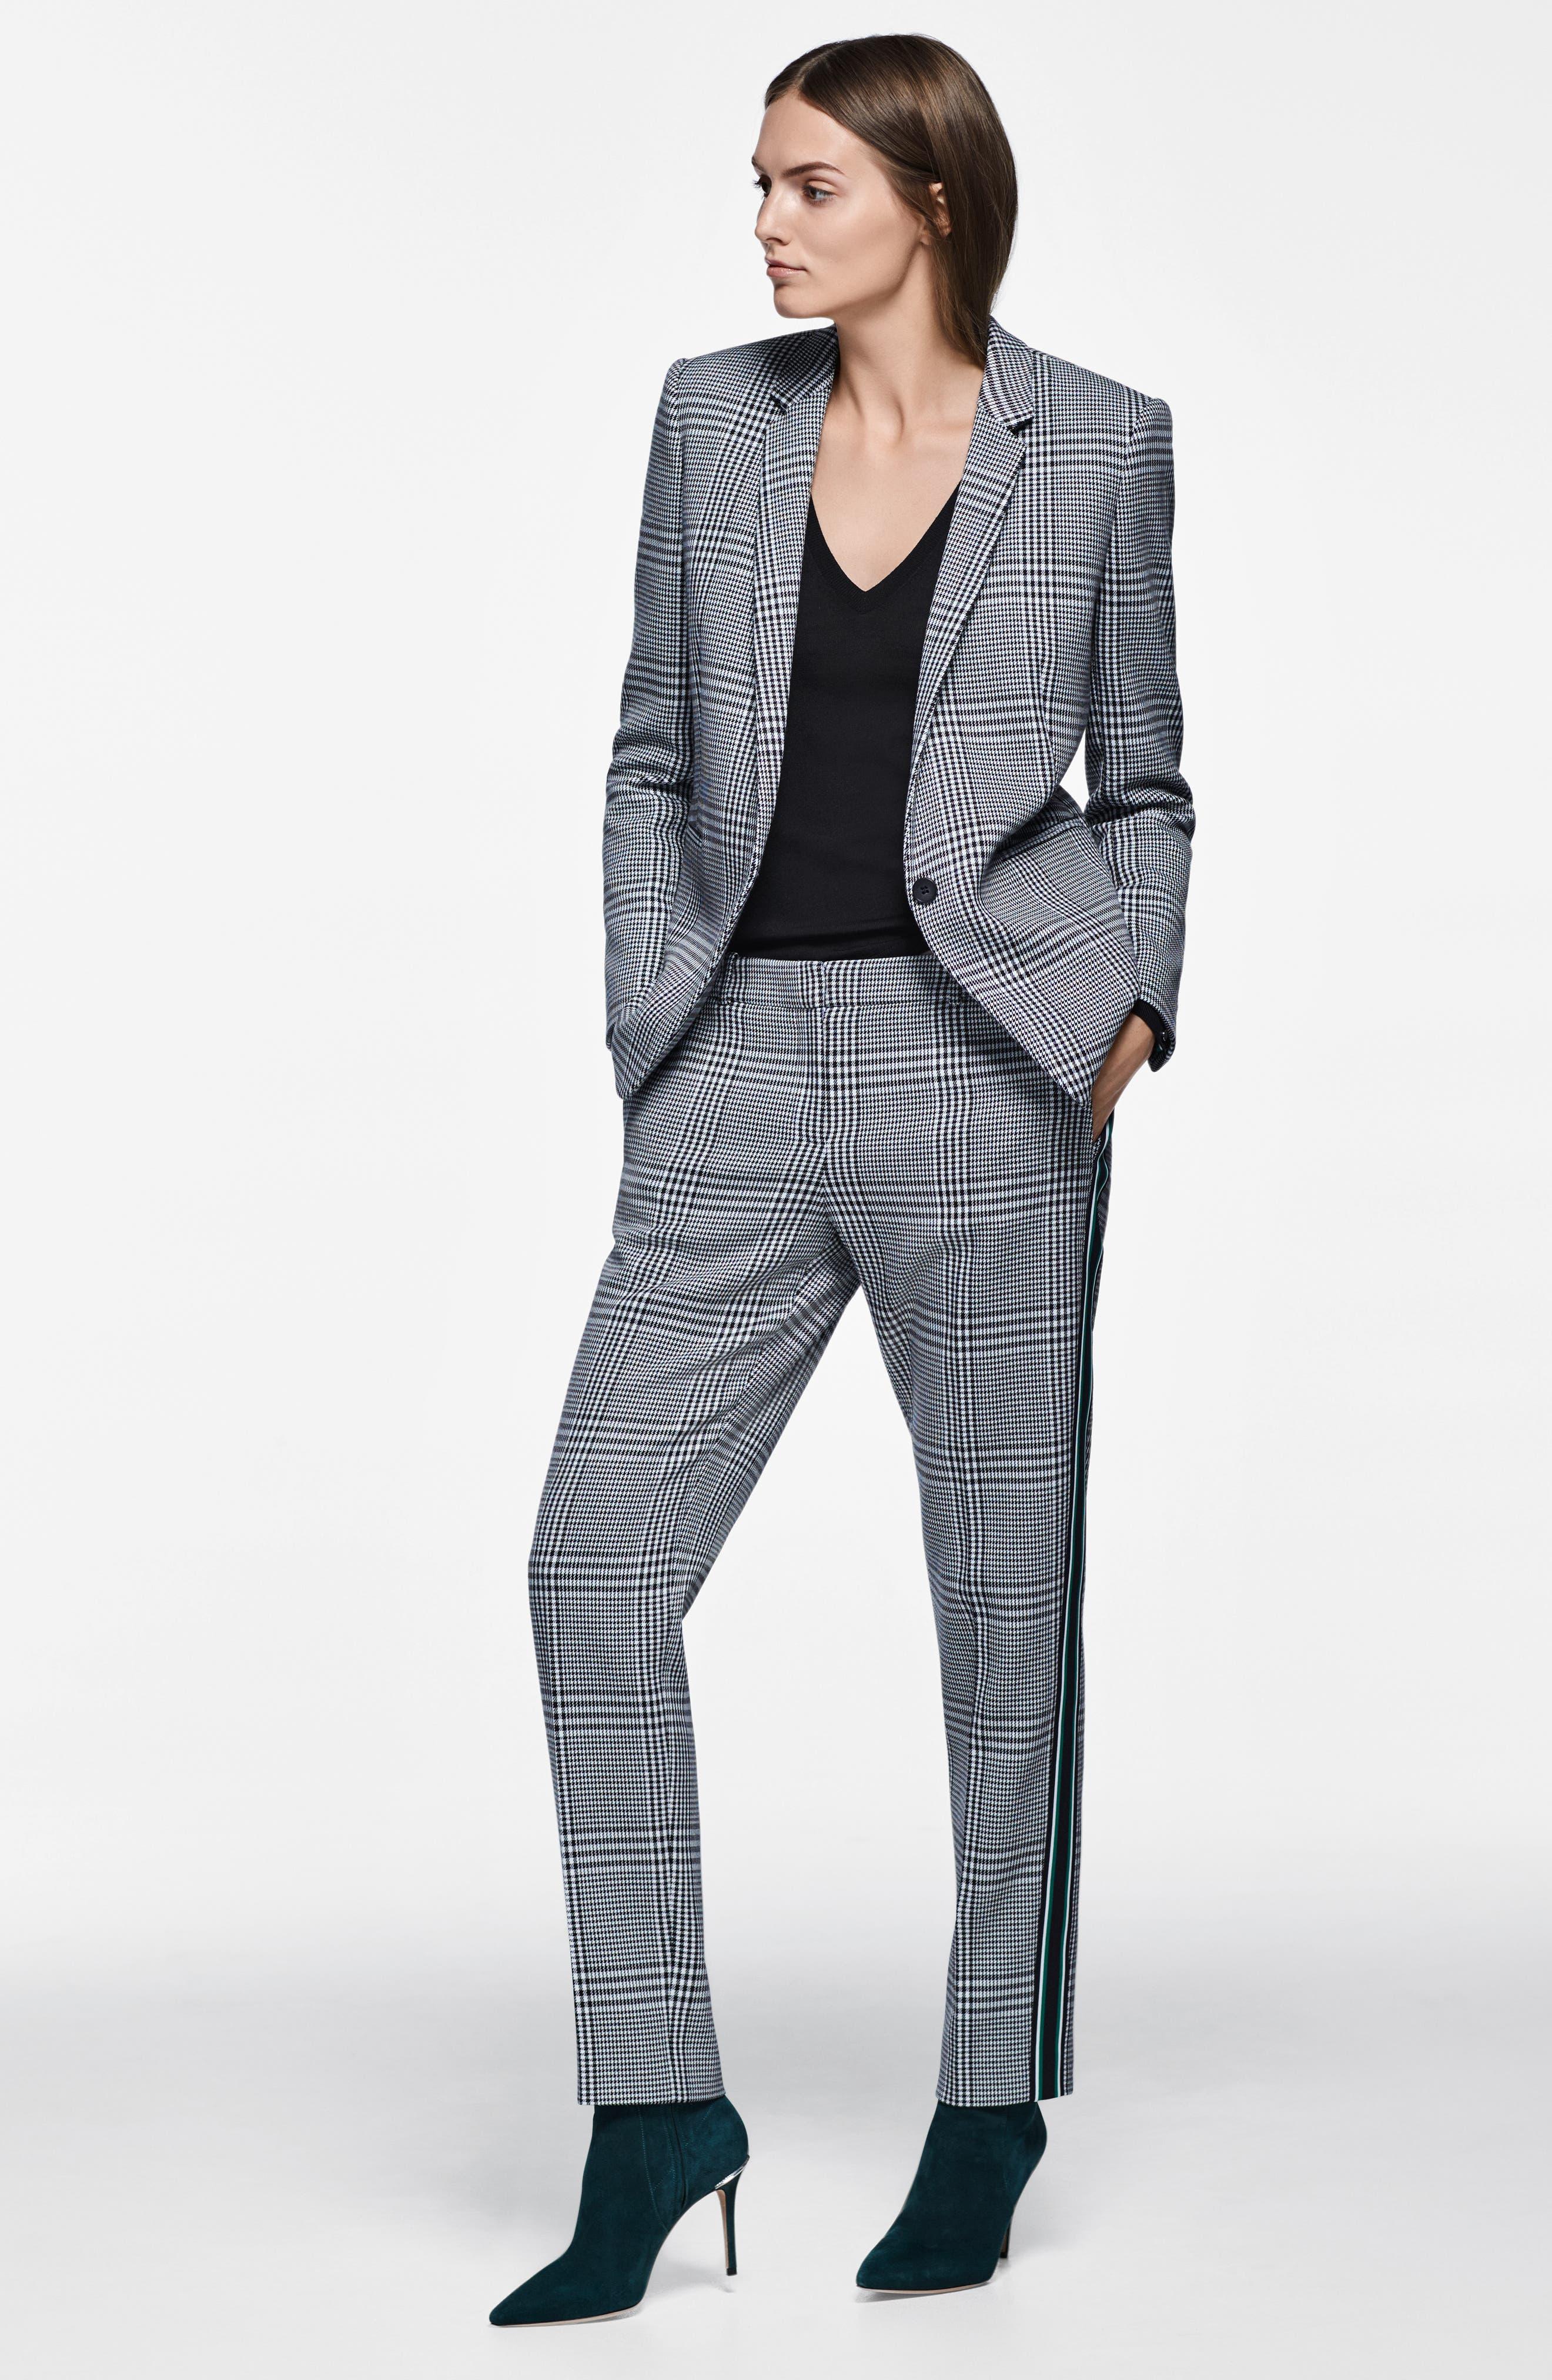 Jemaromina Glen Plaid Suit Jacket,                             Alternate thumbnail 8, color,                             020